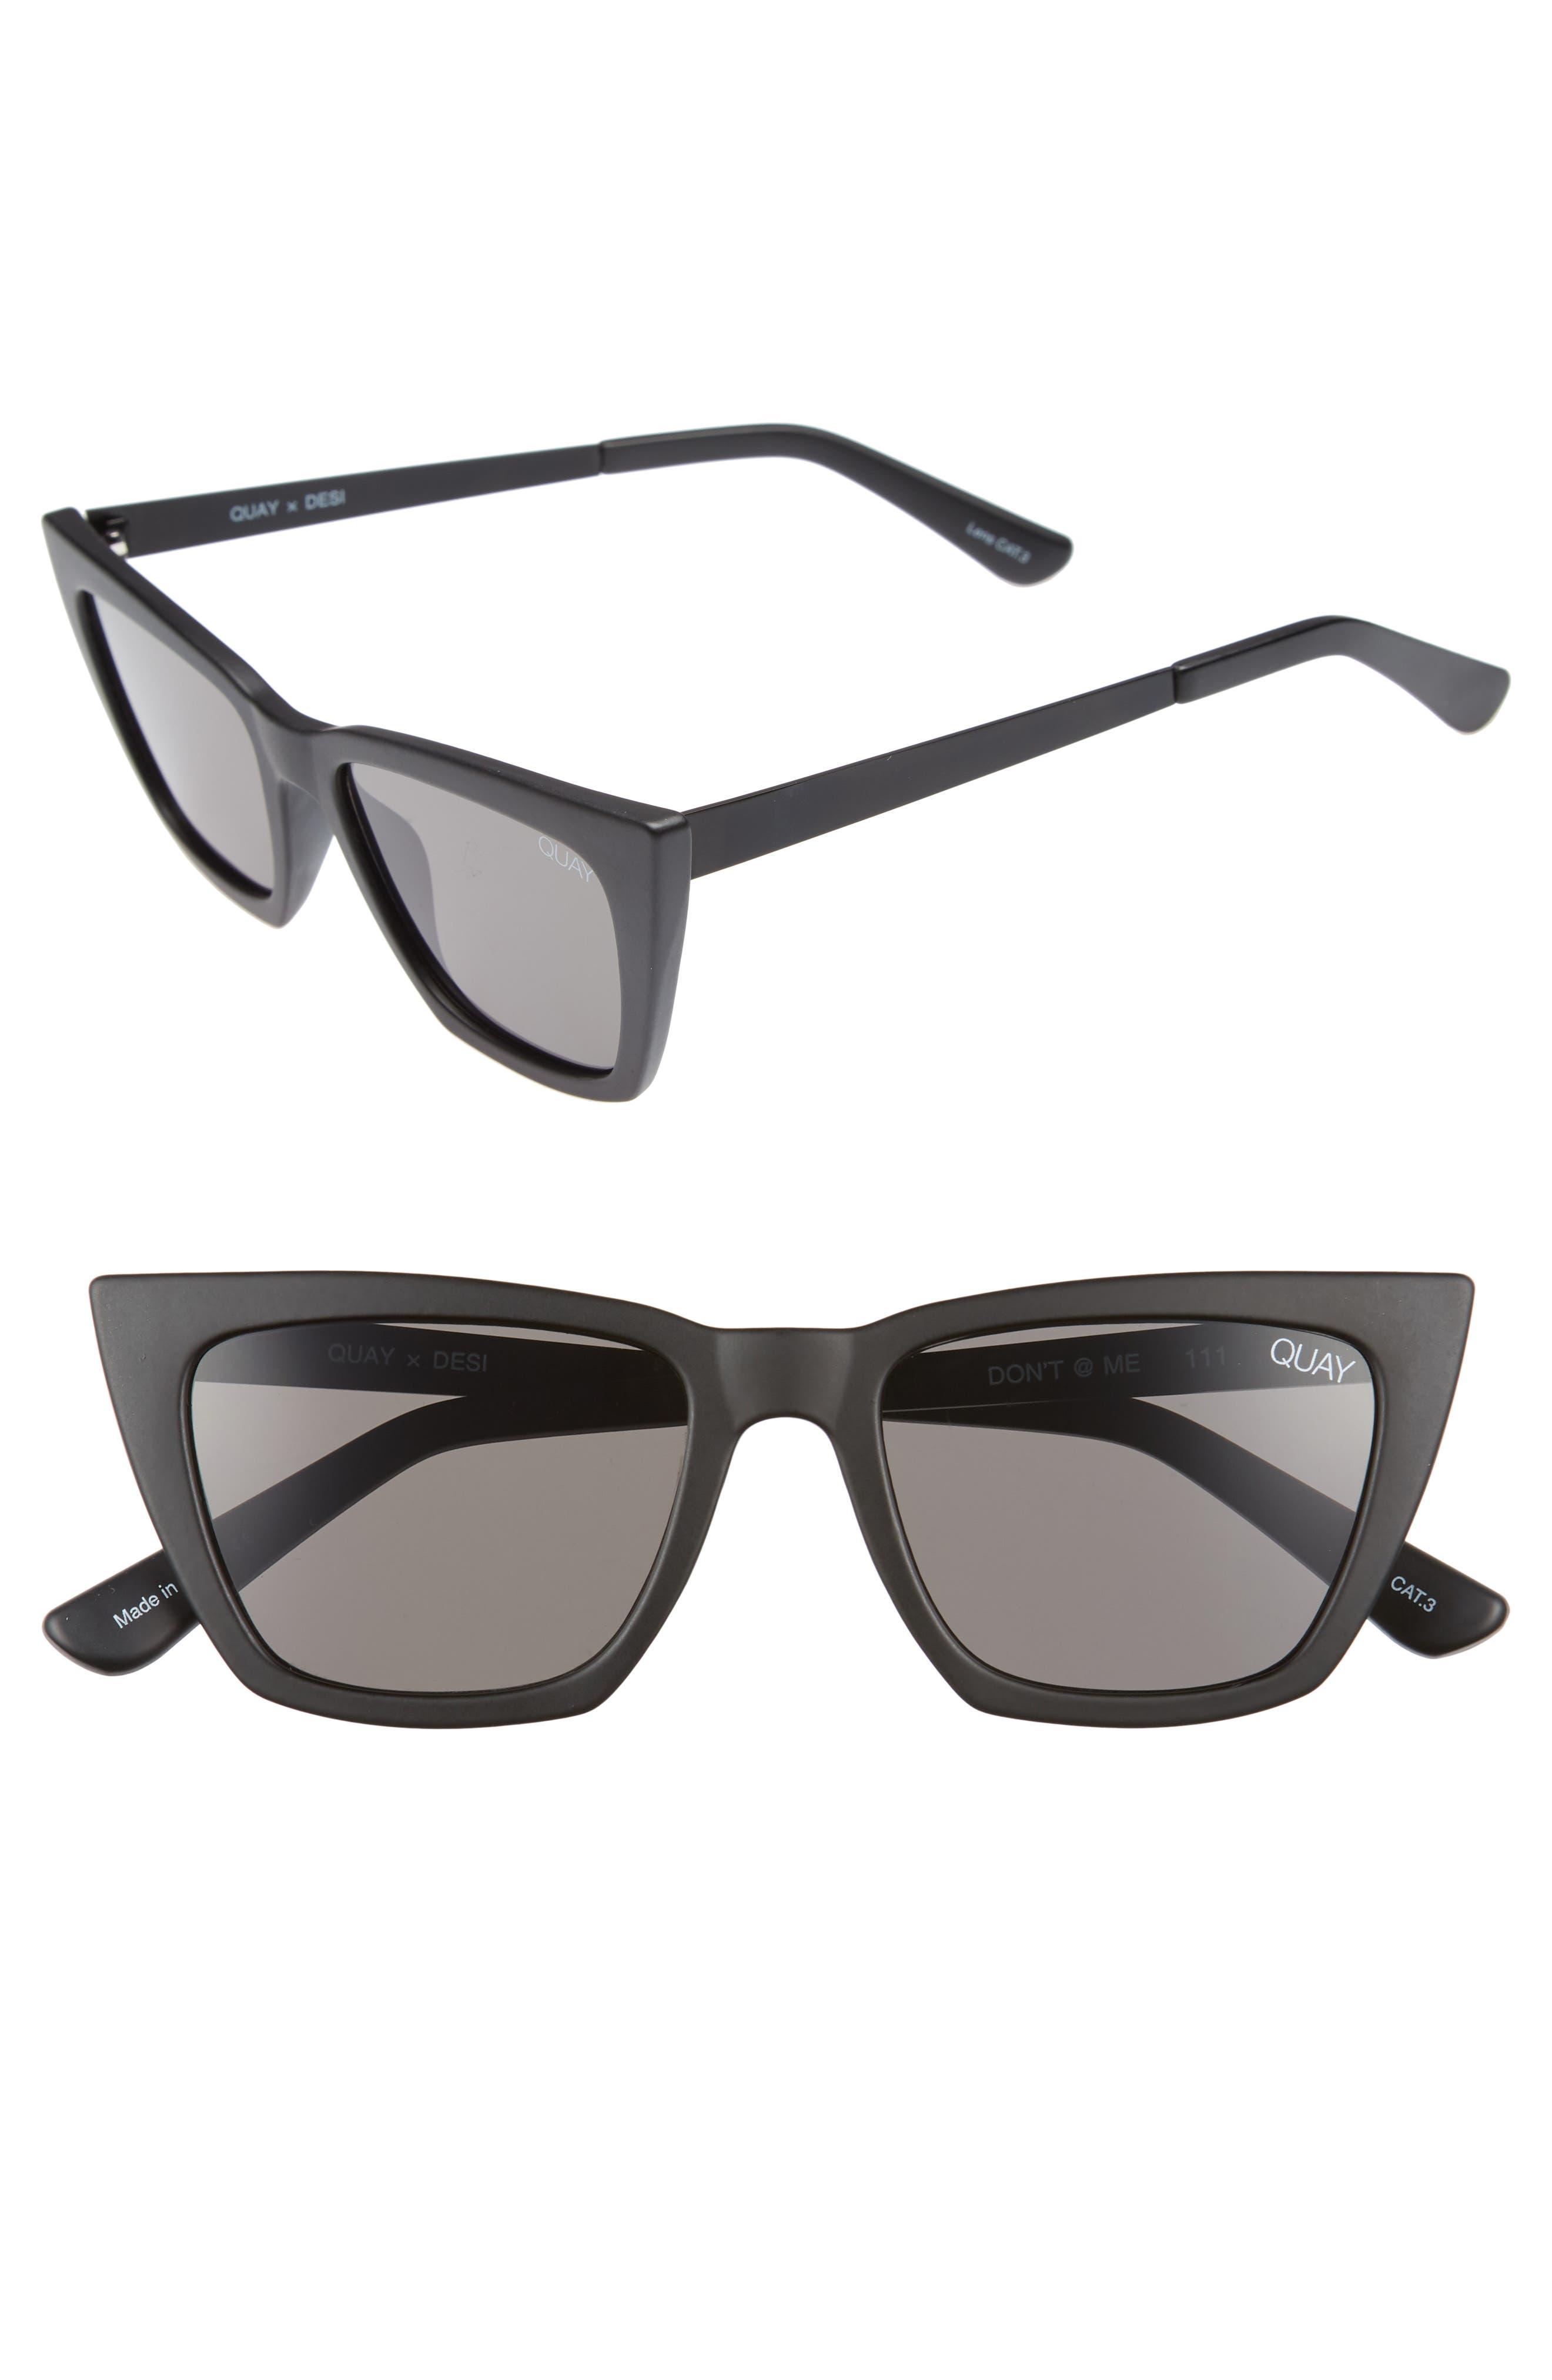 1950s Sunglasses & 50s Glasses   Retro Cat Eye Sunglasses Womens Quay Australia X Desi Perkins DonT @ Me 48Mm Cat Eye Sunglasses - White Smoke $65.00 AT vintagedancer.com